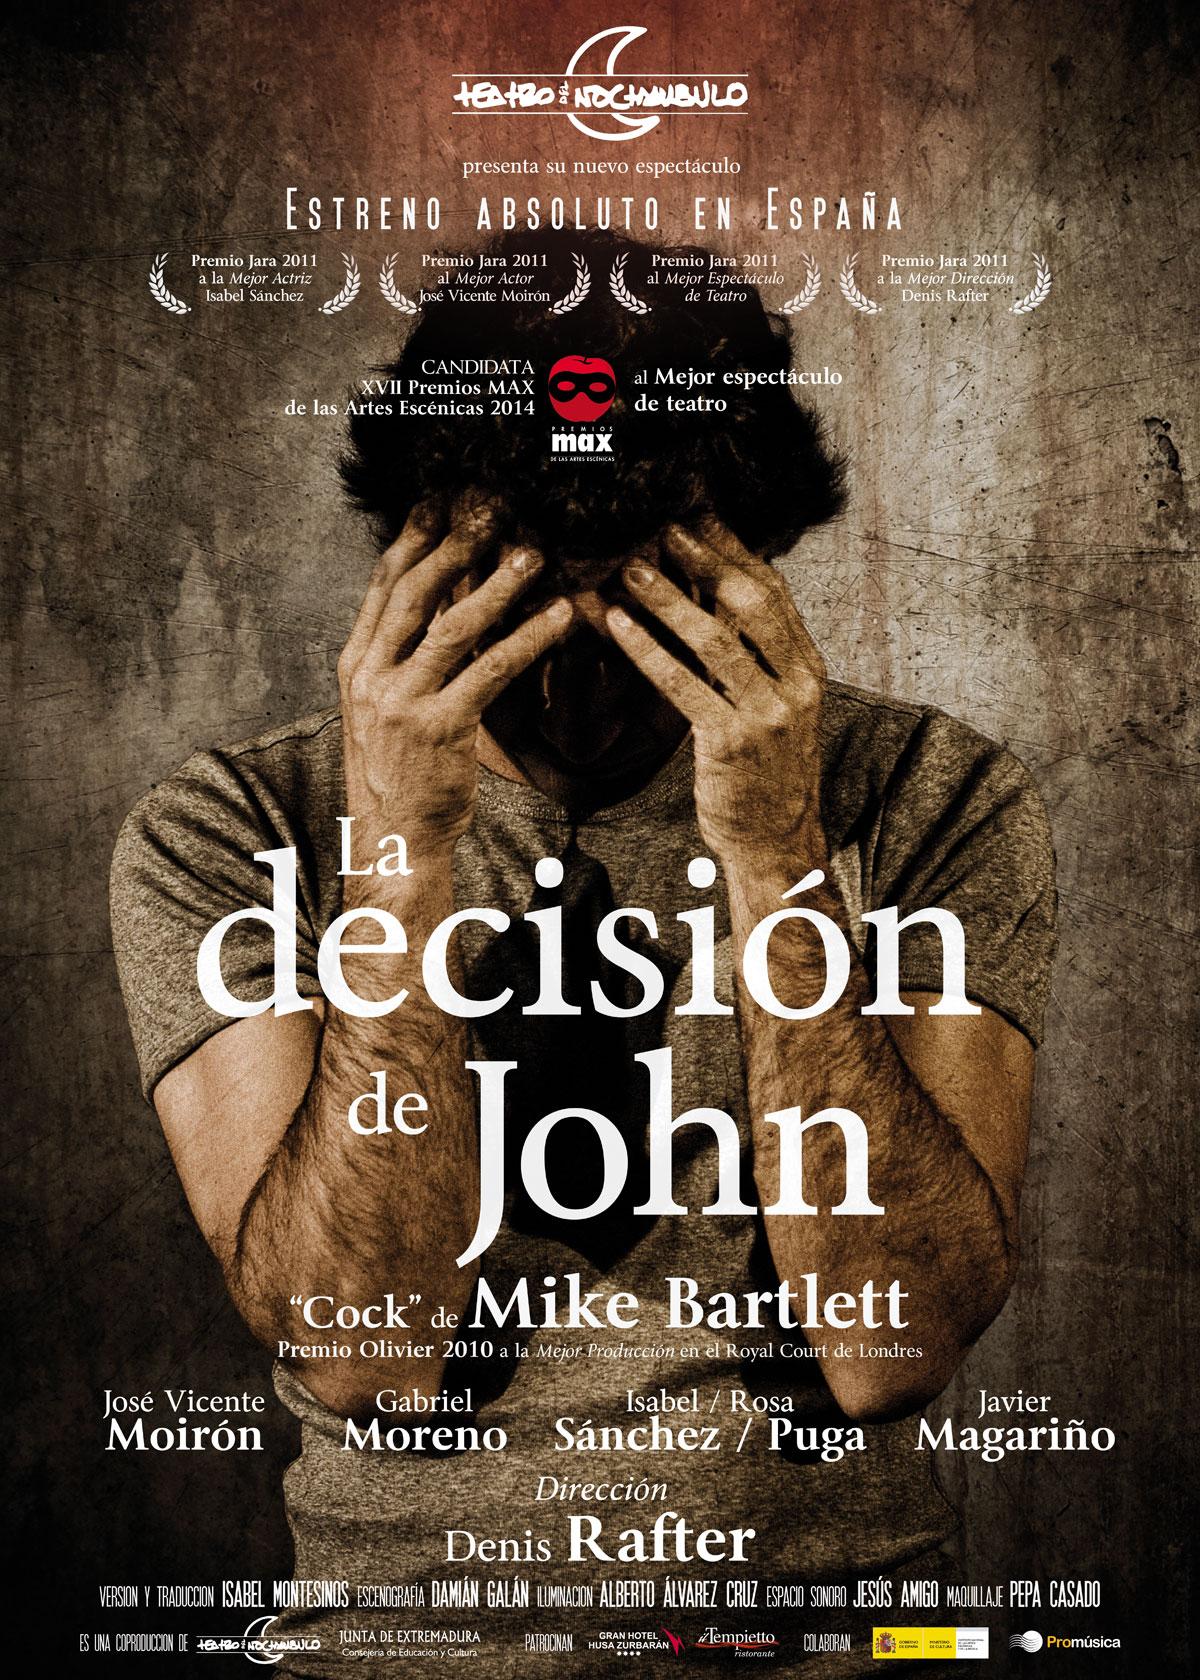 La decisión de John